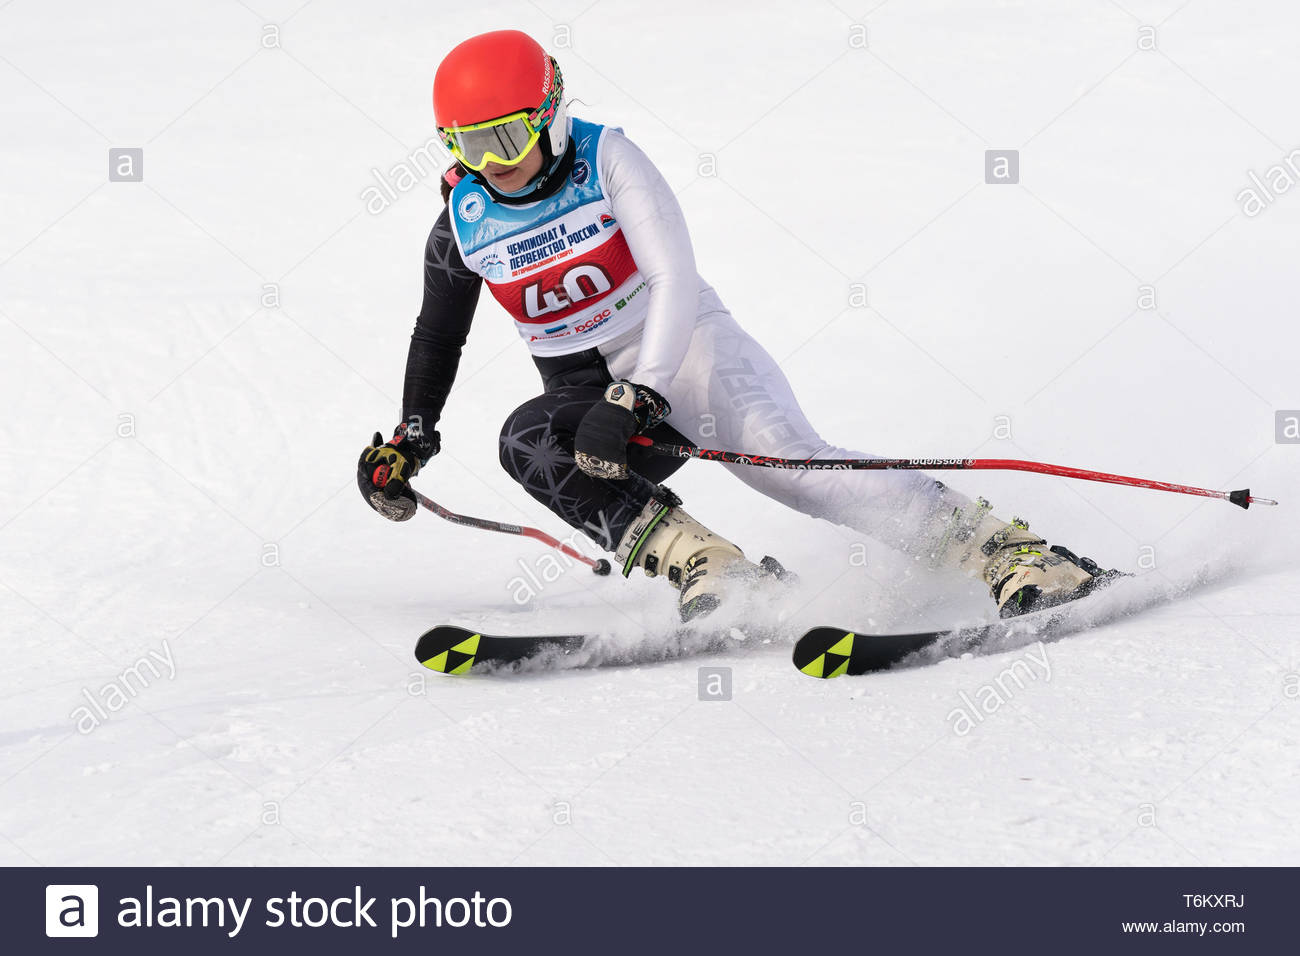 KAMCHATKA, RUSSIA - APRIL 2, 2019: Russian Women's Alpine Skiing Cup, International Ski Federation Championship - giant slalom. Mountain skier Kudryav - Stock Image